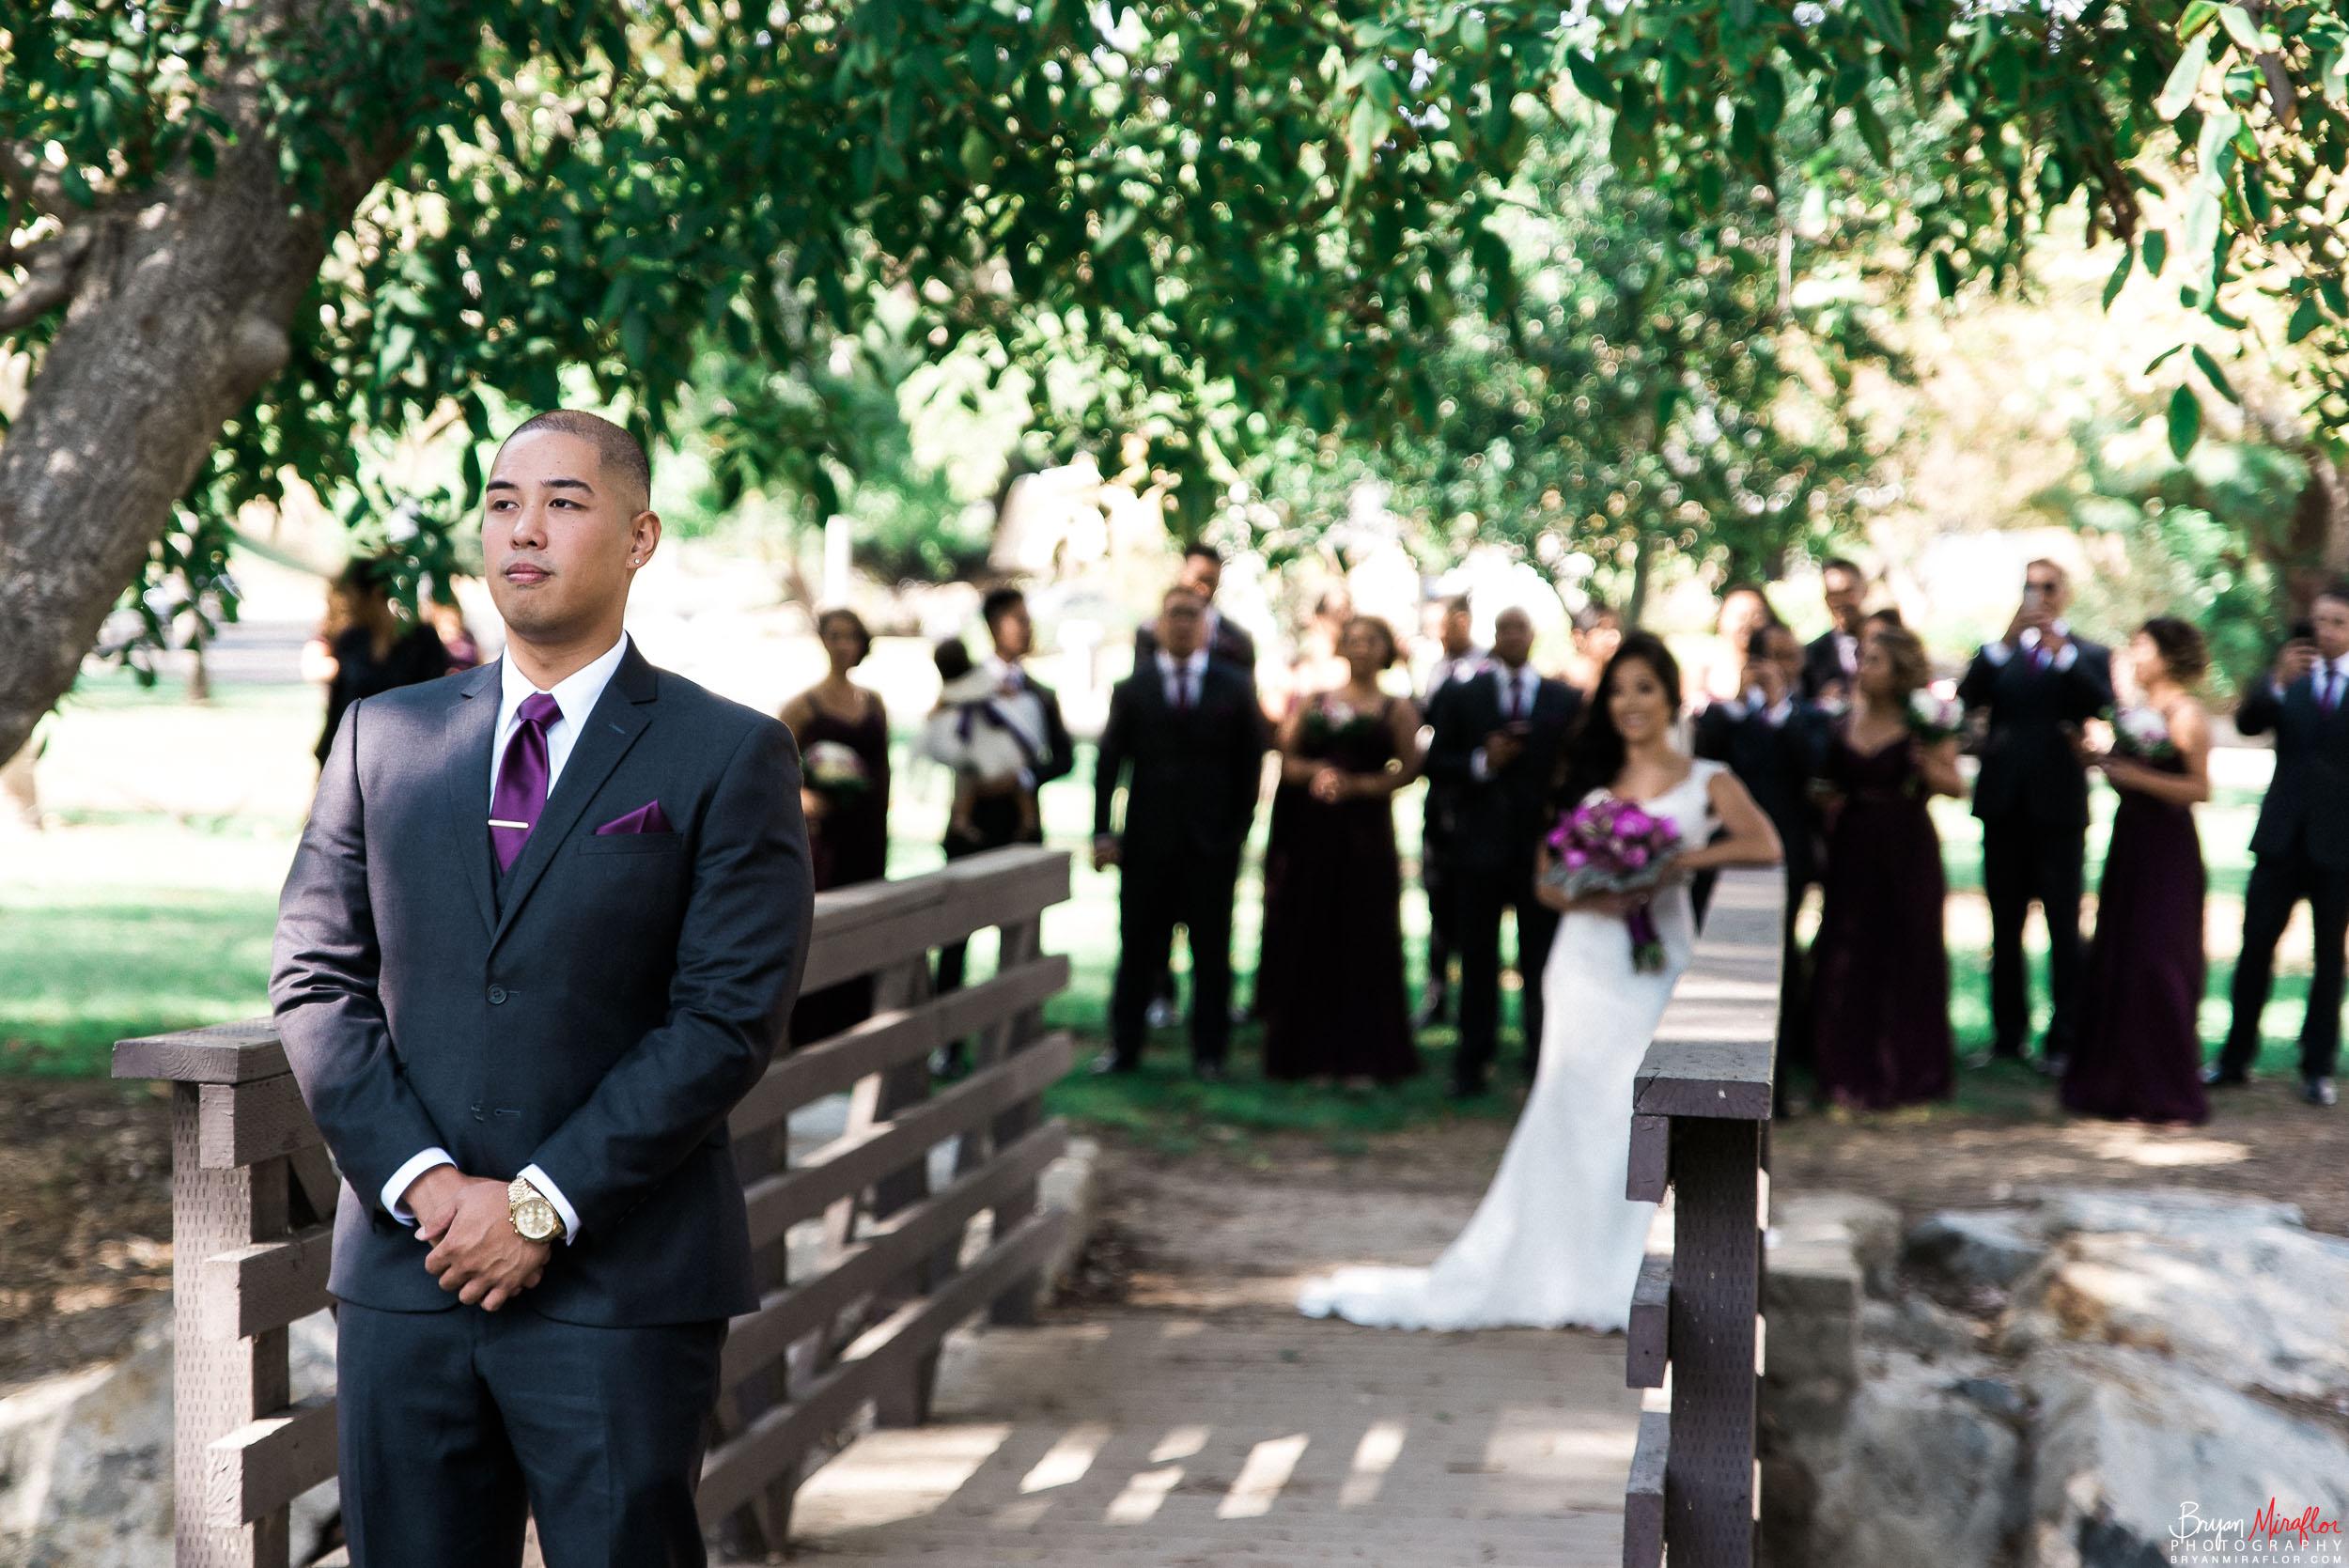 Bryan-Miraflor-Photography-Trisha-Dexter-Married-20170923-015.jpg